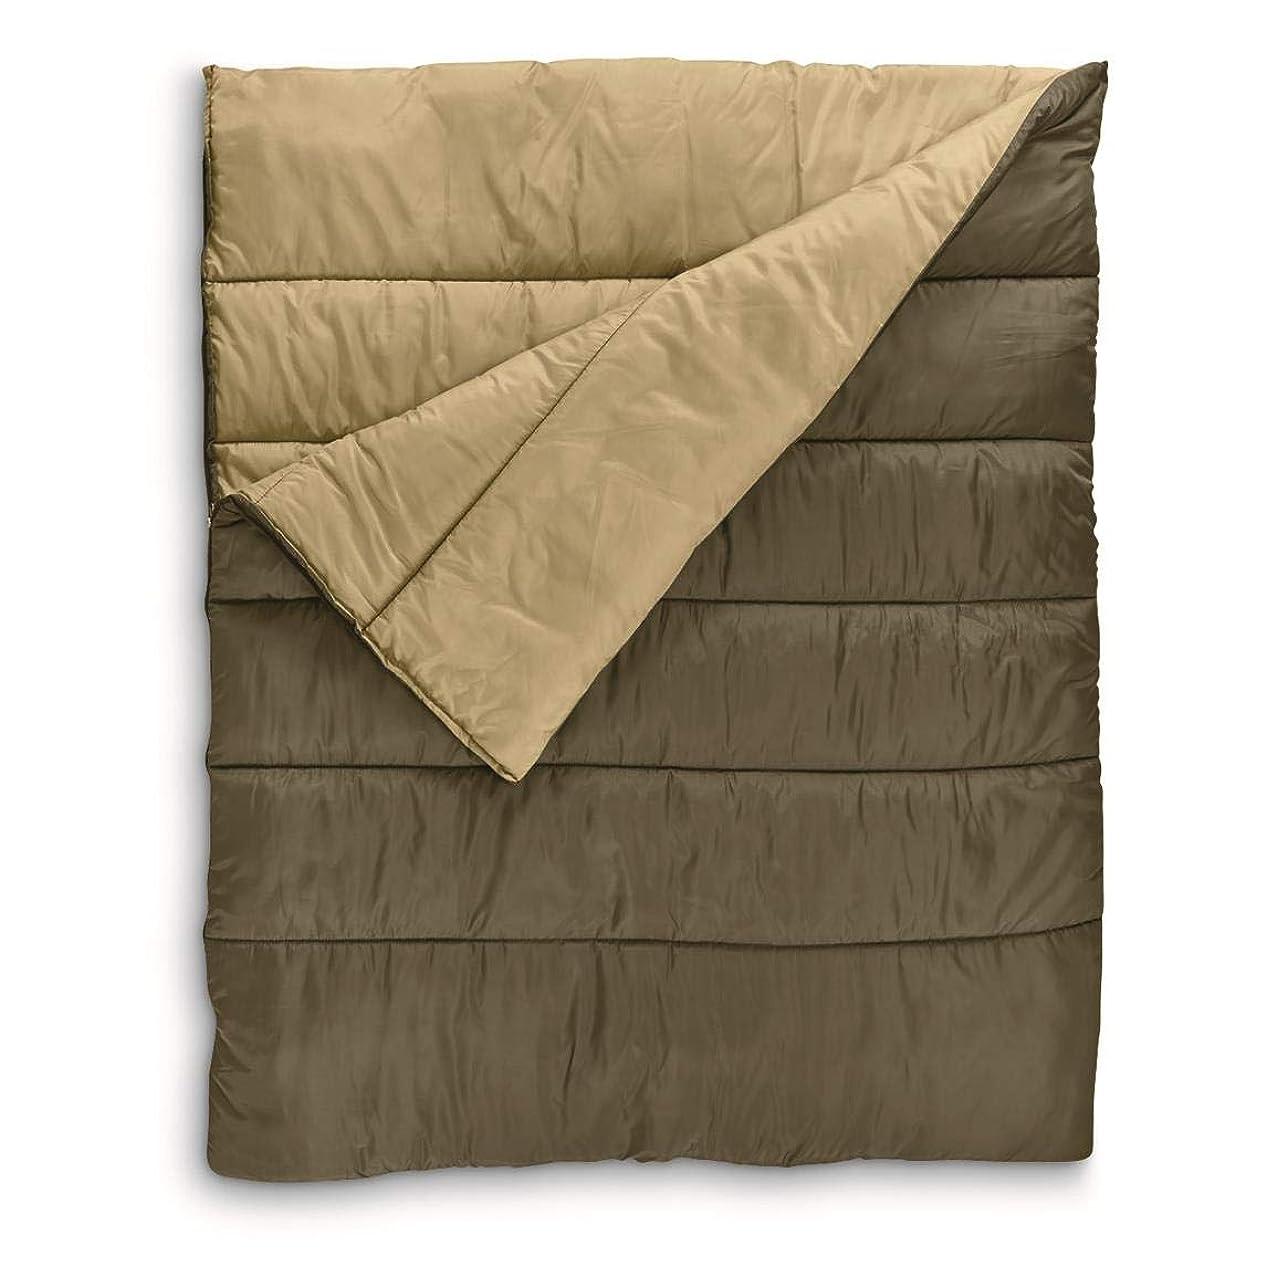 Guide Gear Rectangular Double Sleeping Bag, 20°F